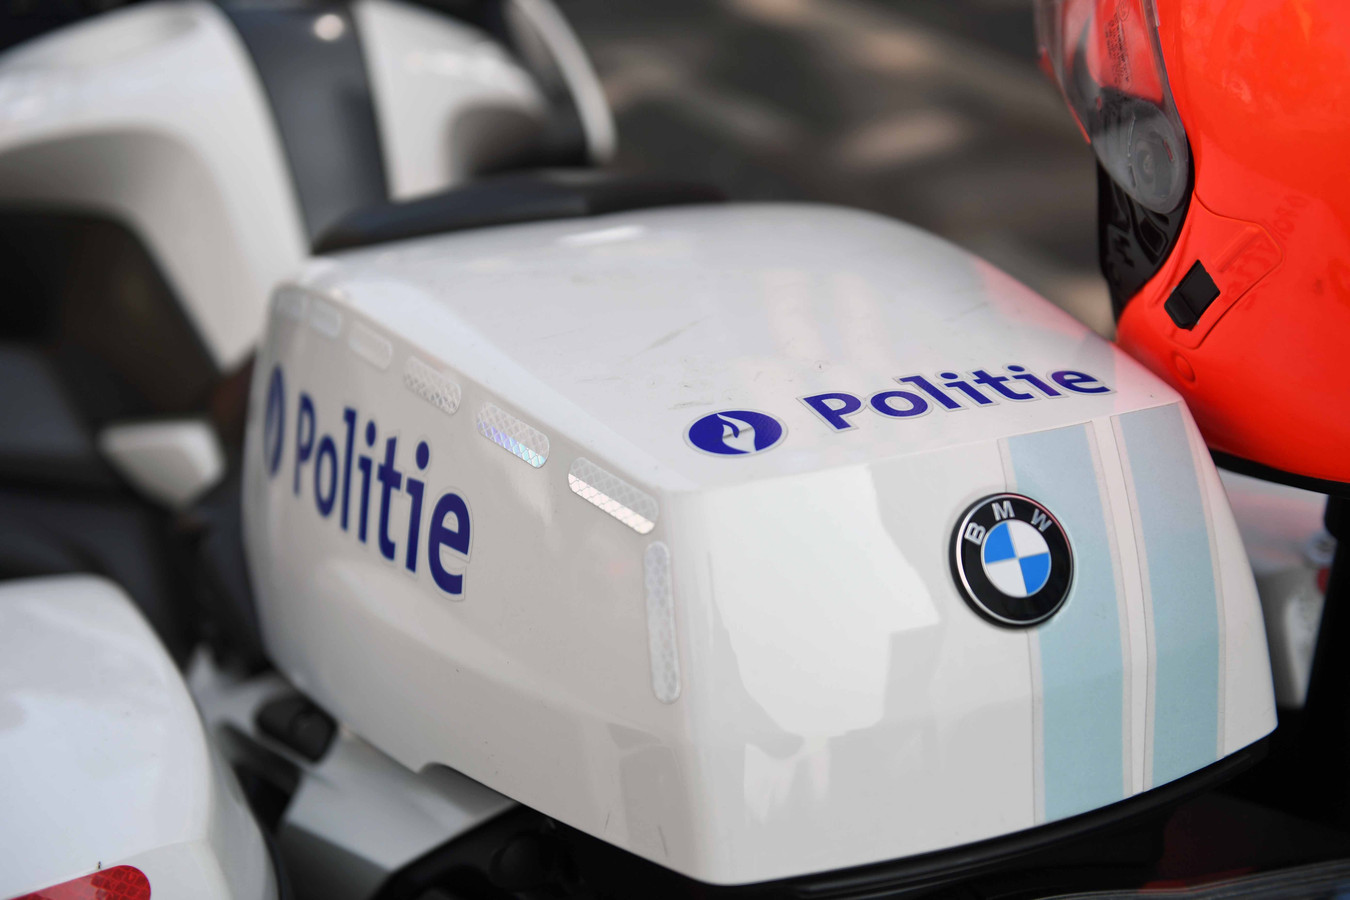 Illustratie PZ Leuven. Politie